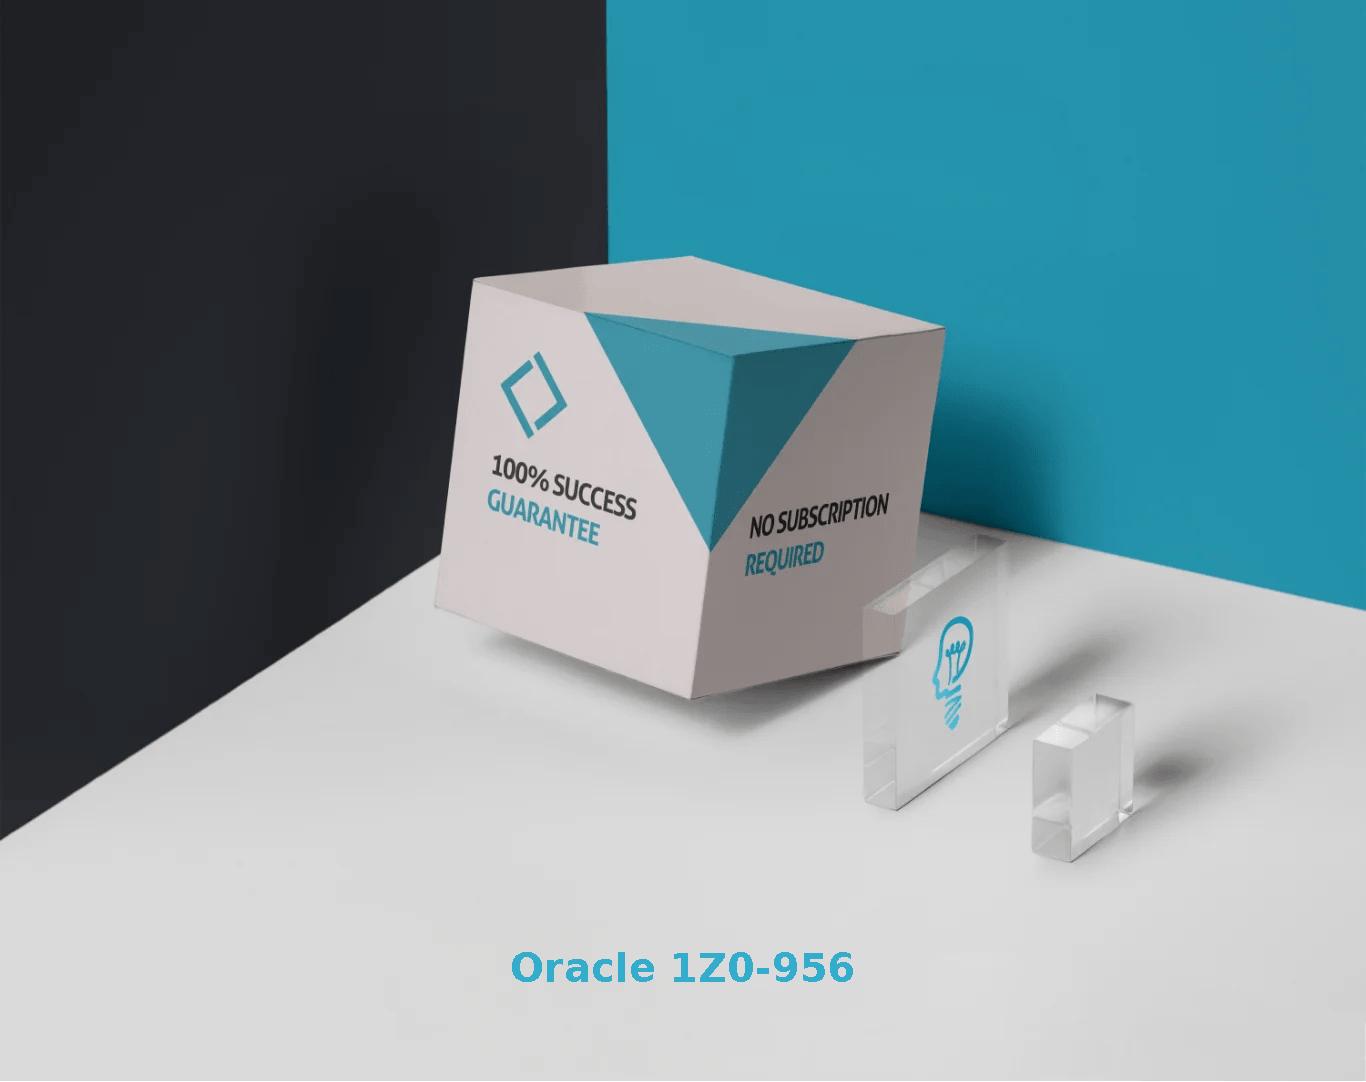 Oracle 1Z0-956 Exams